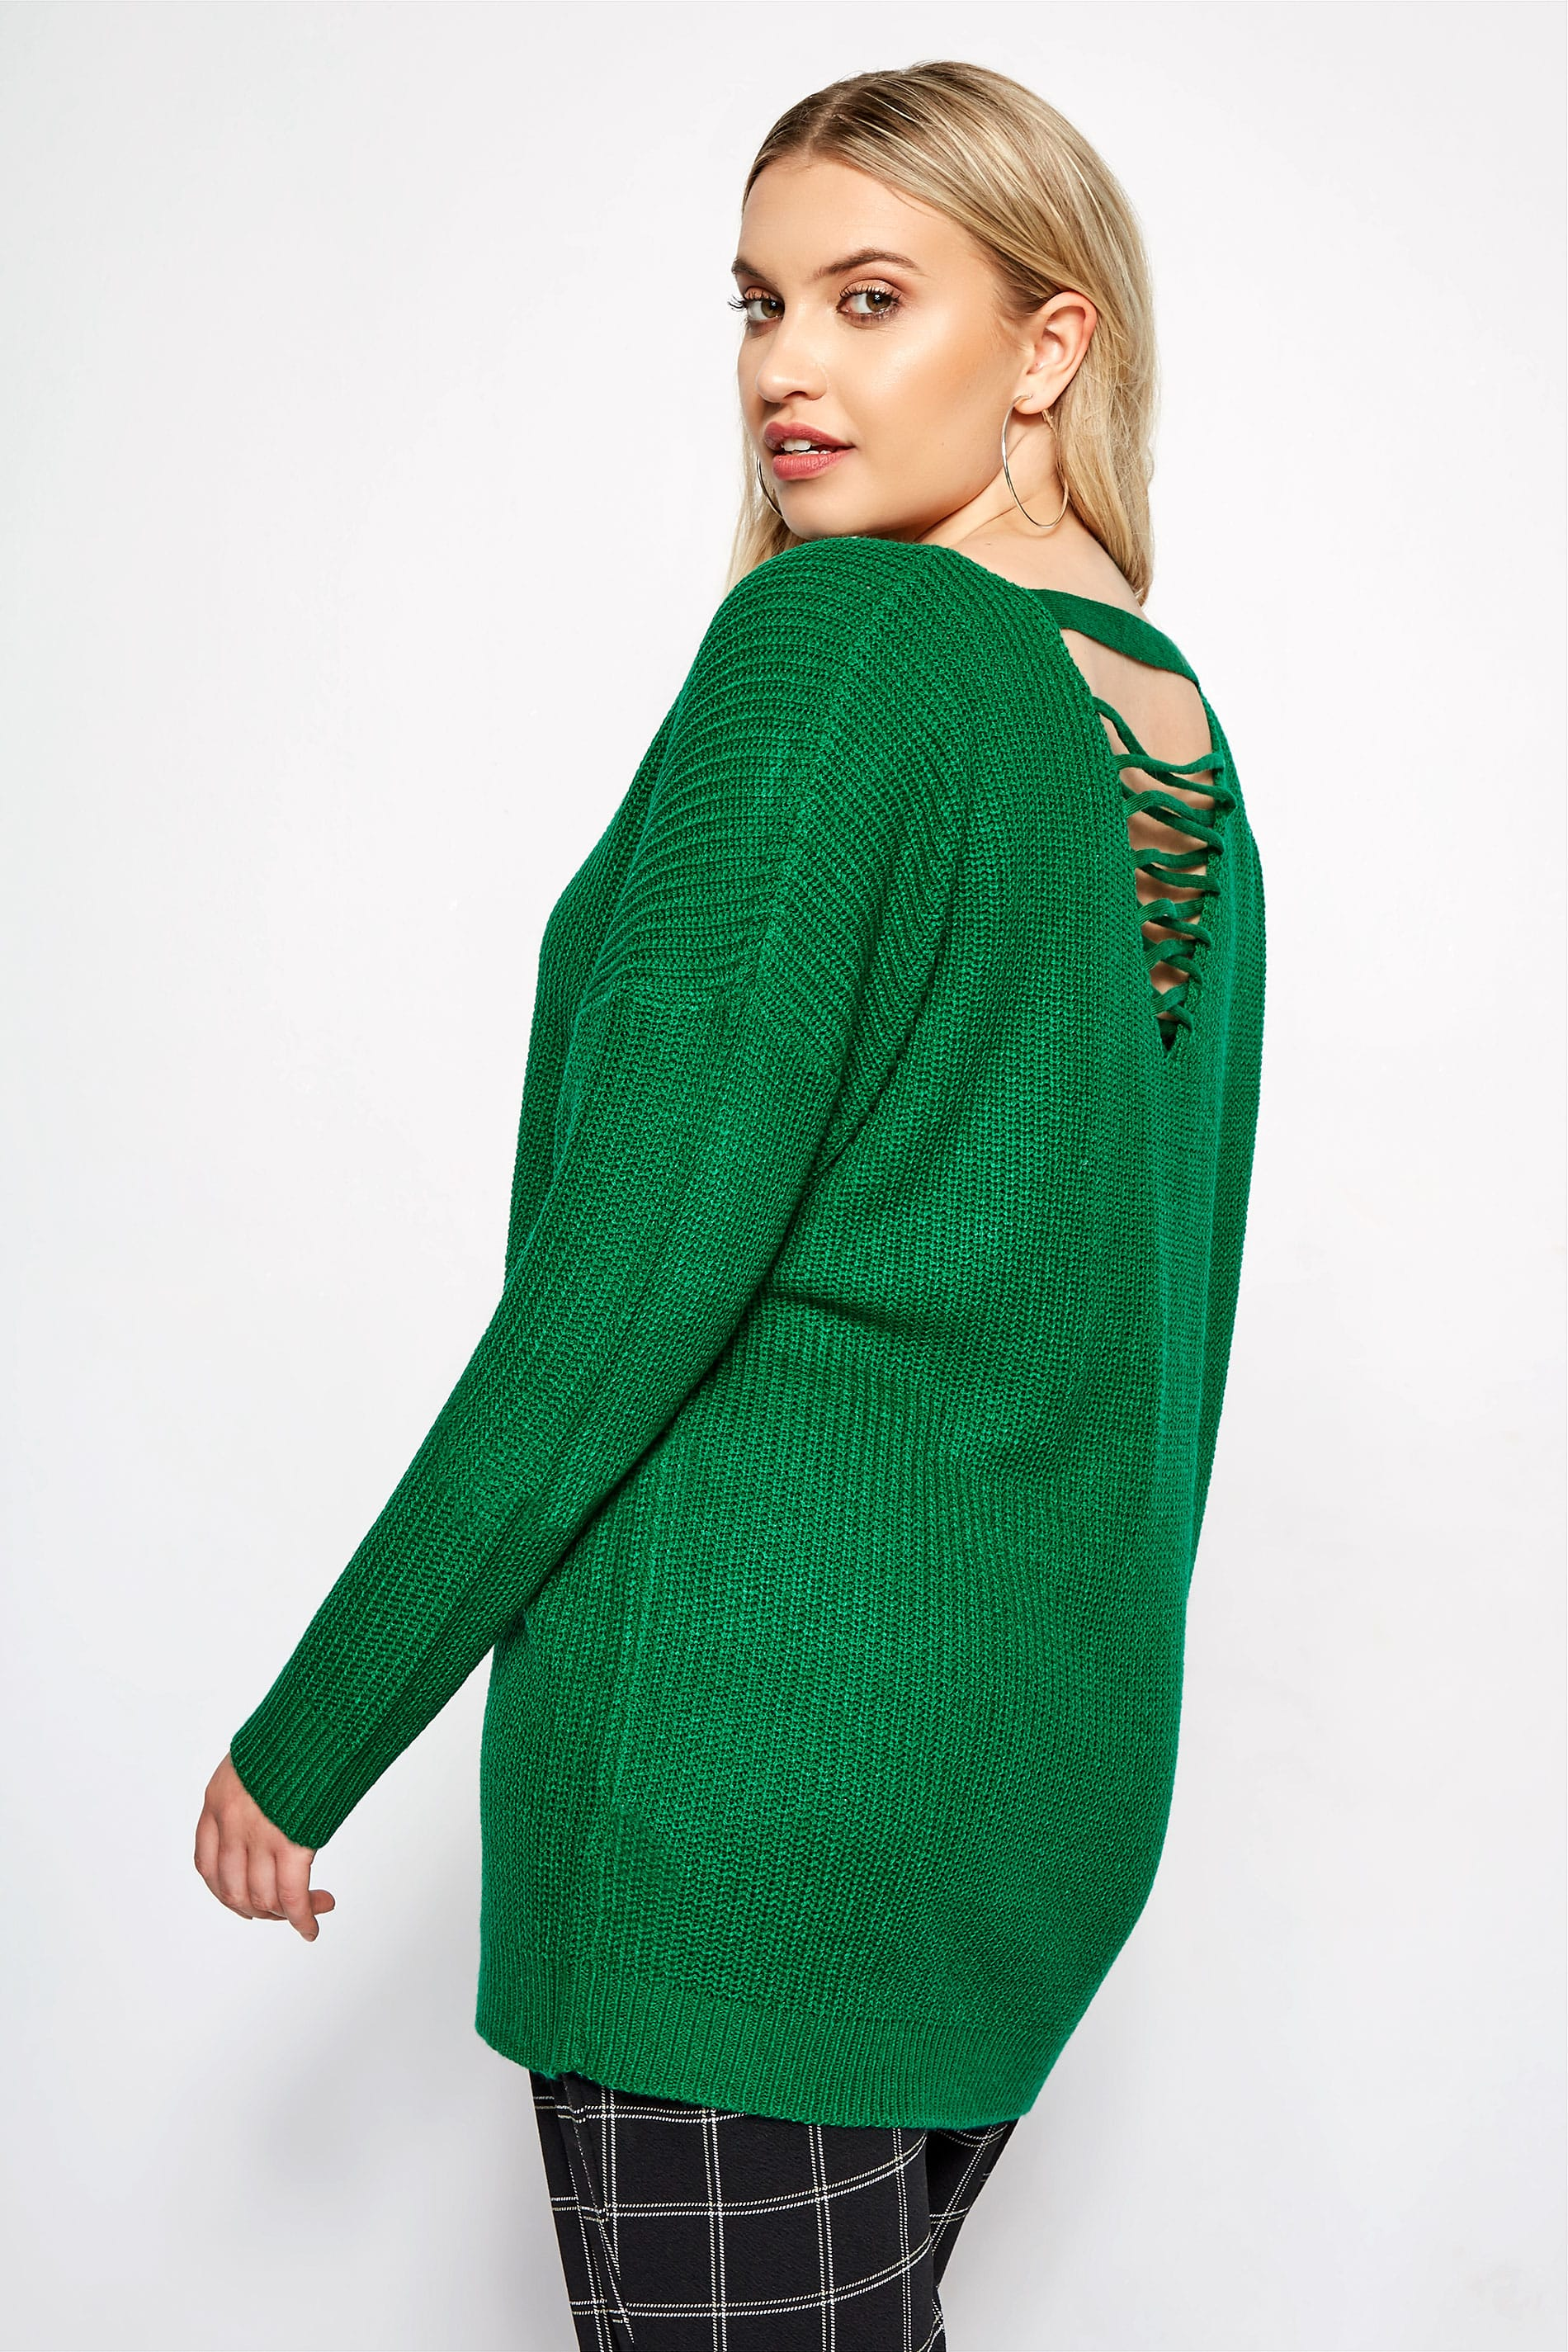 Green Lattice Back Knitted Jumper